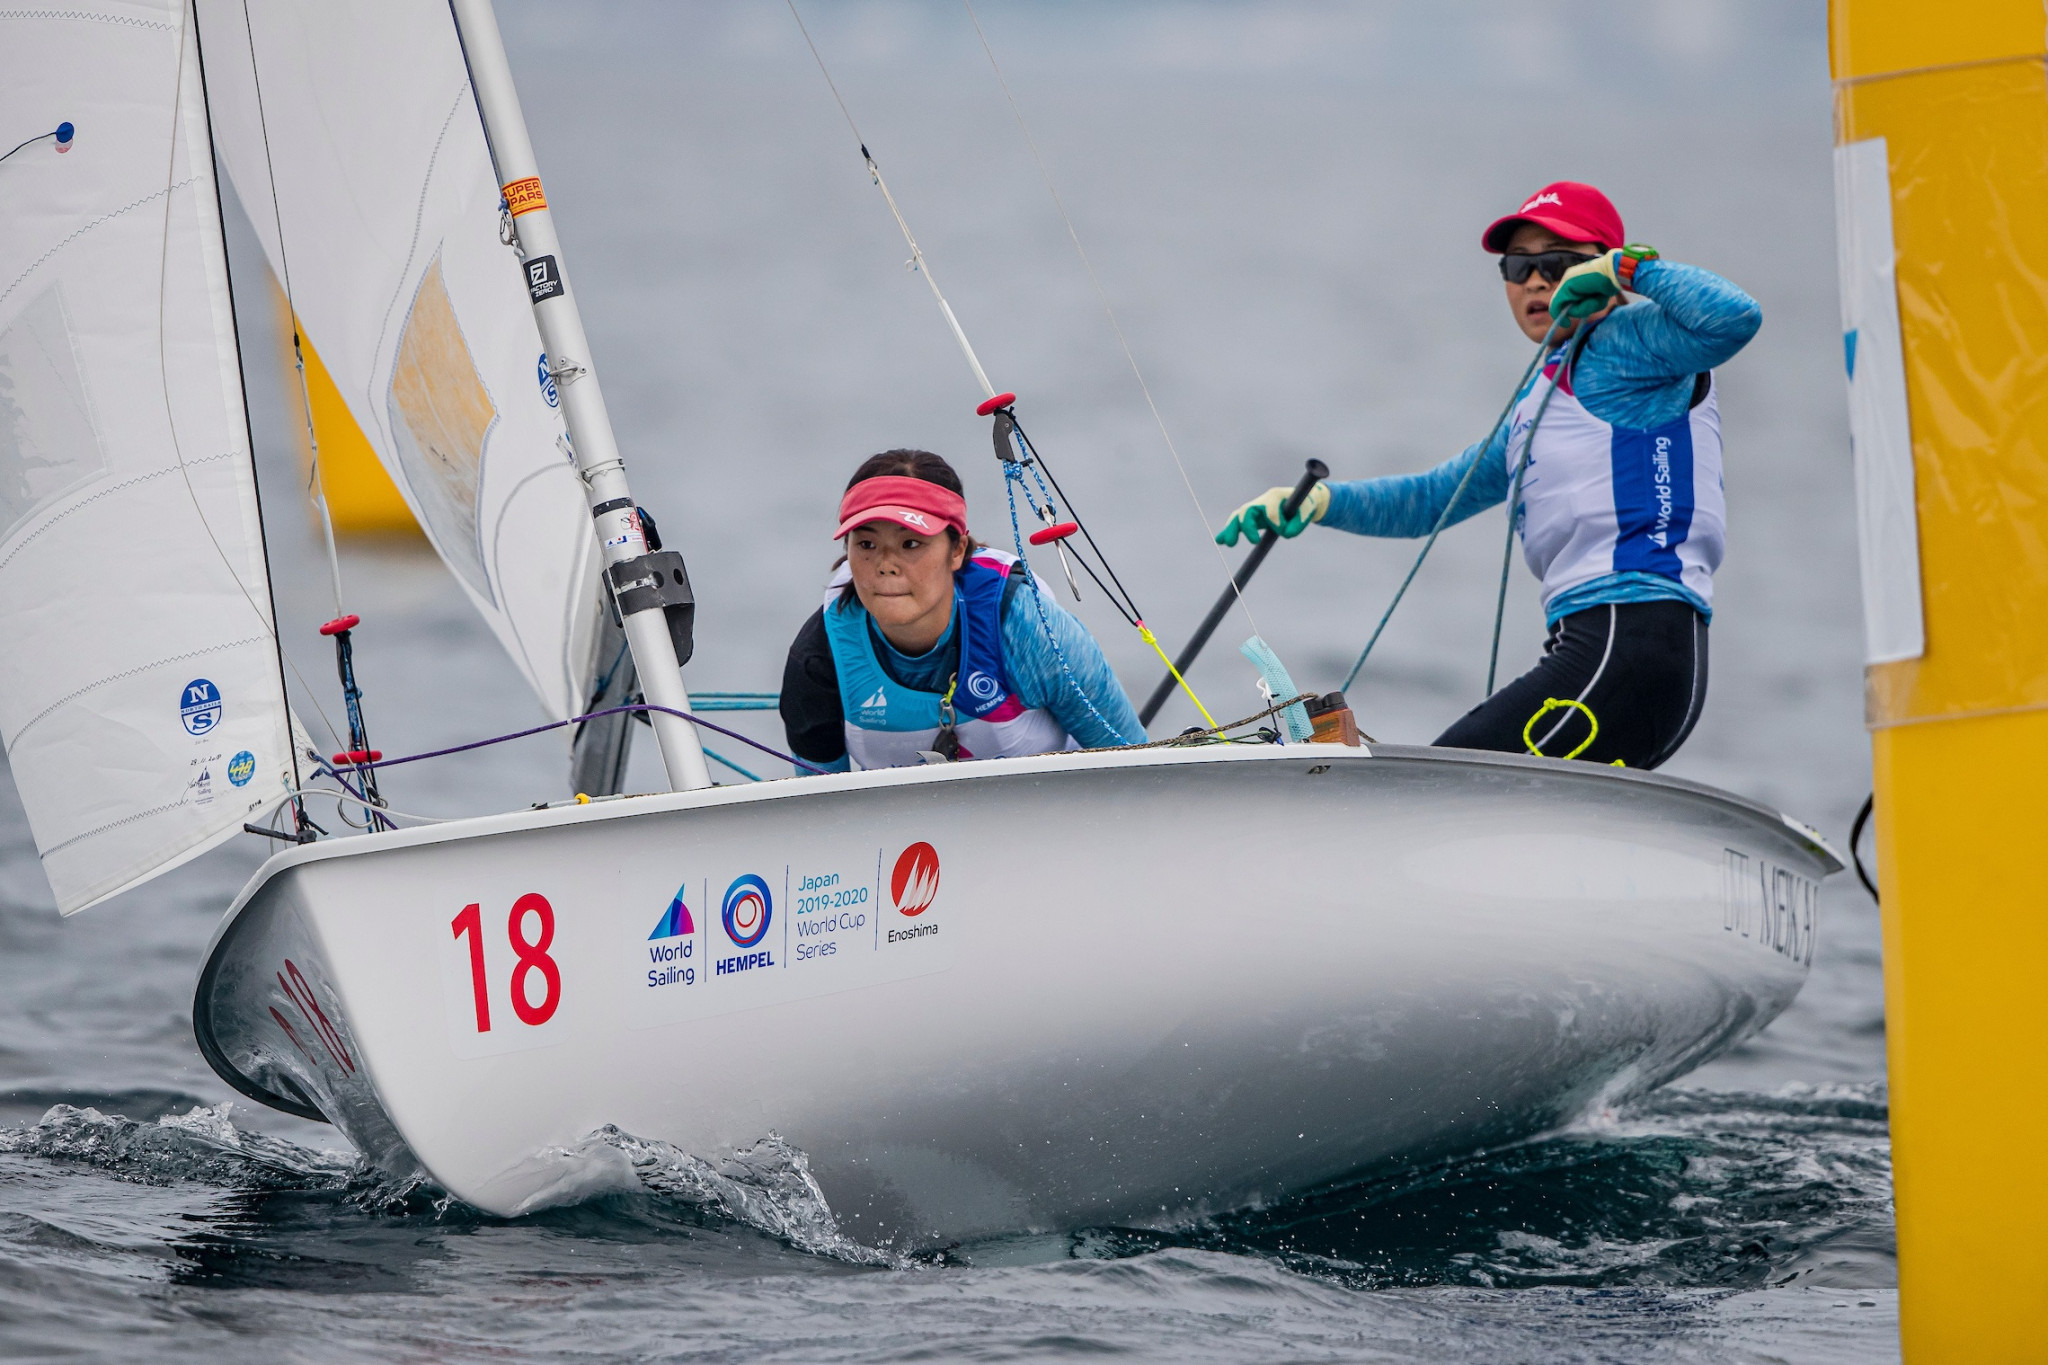 Yuki Hayashi and Chika Nishidai lead the women's 470 fleet on home water ©World Sailing